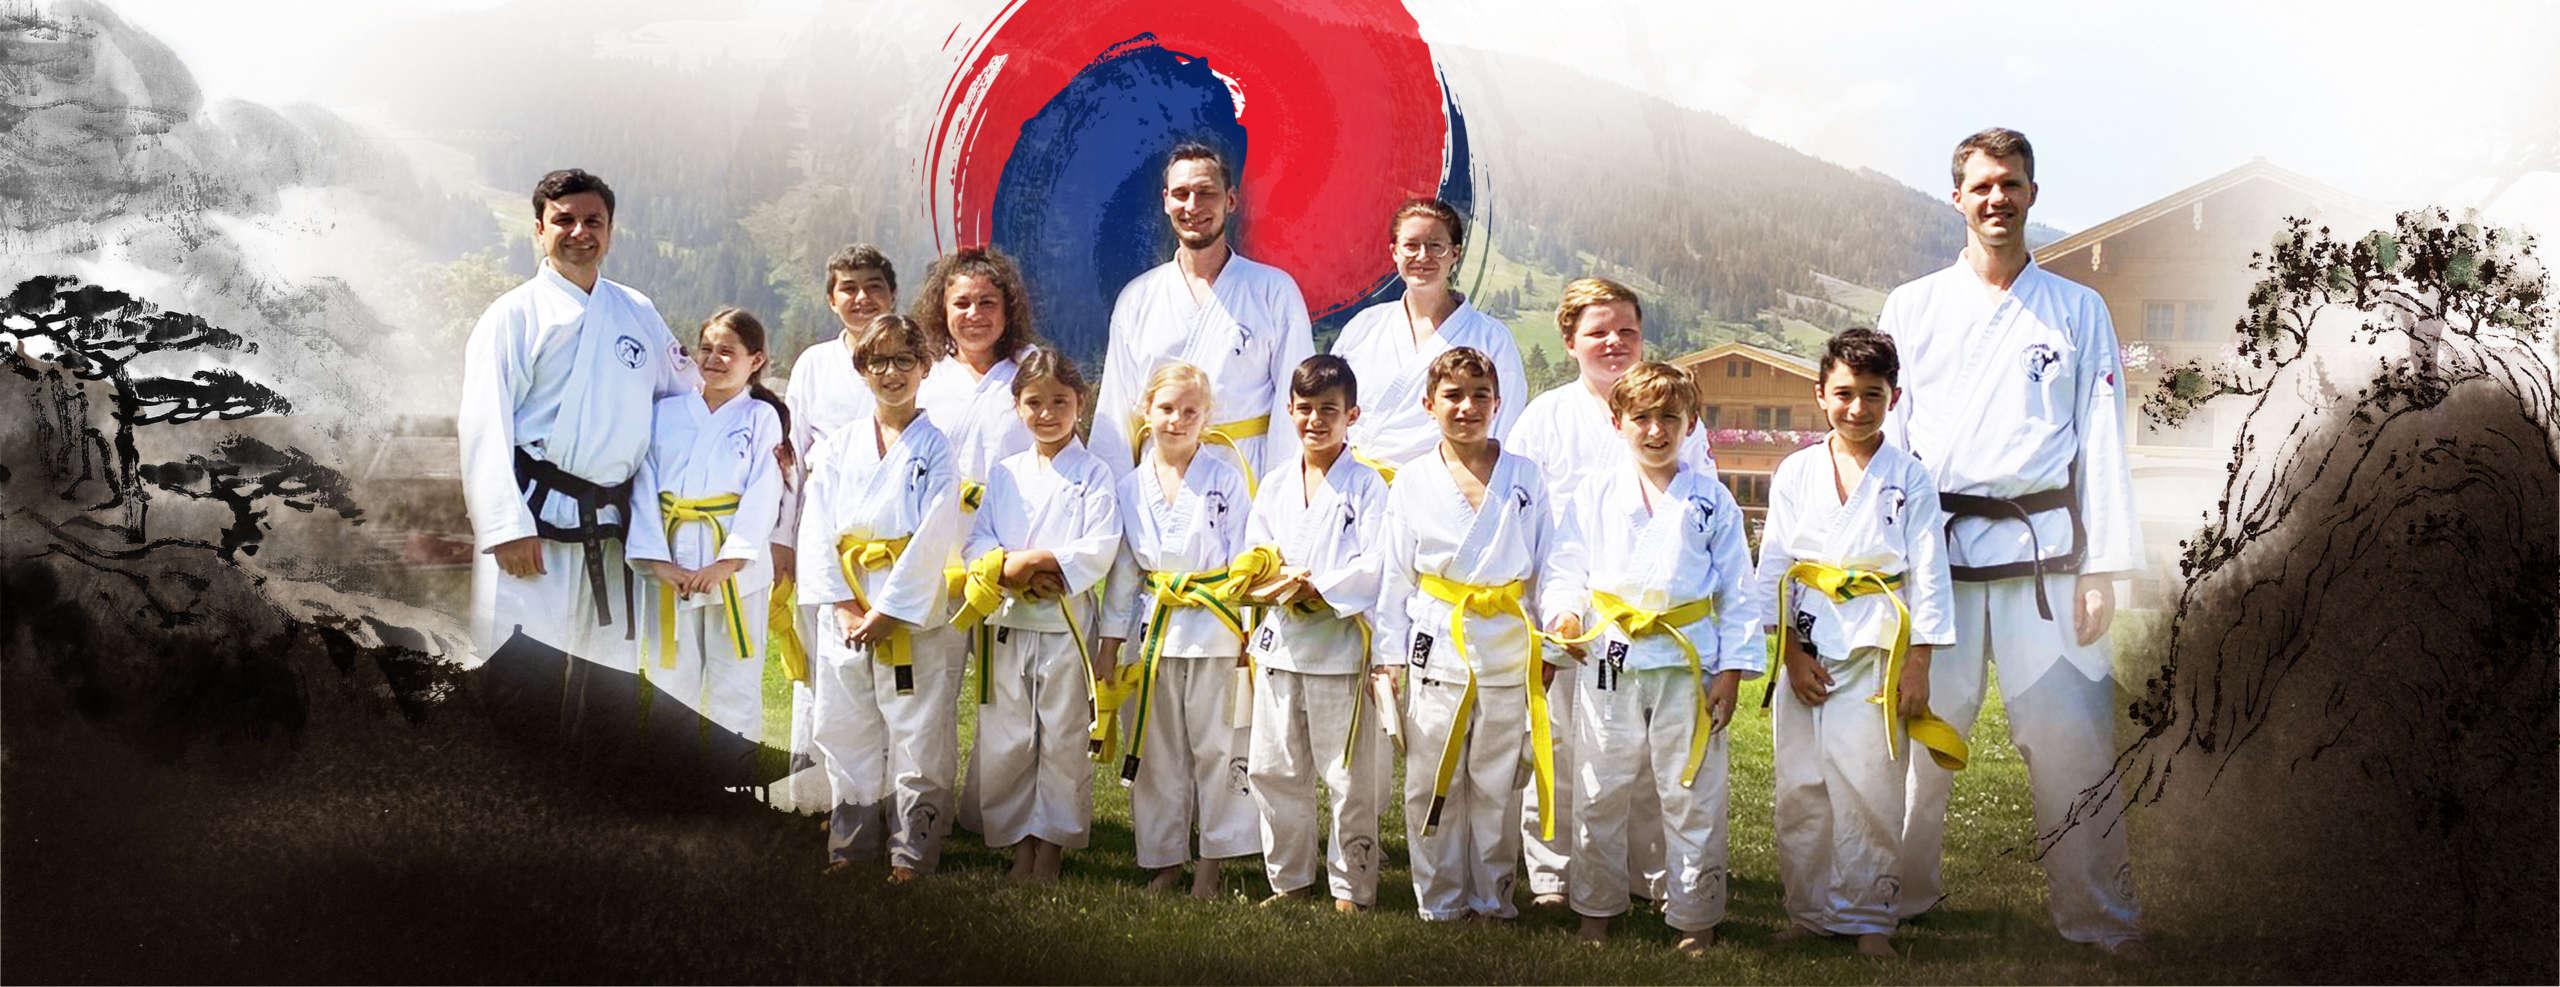 WinTaekwondo Kursprogramme